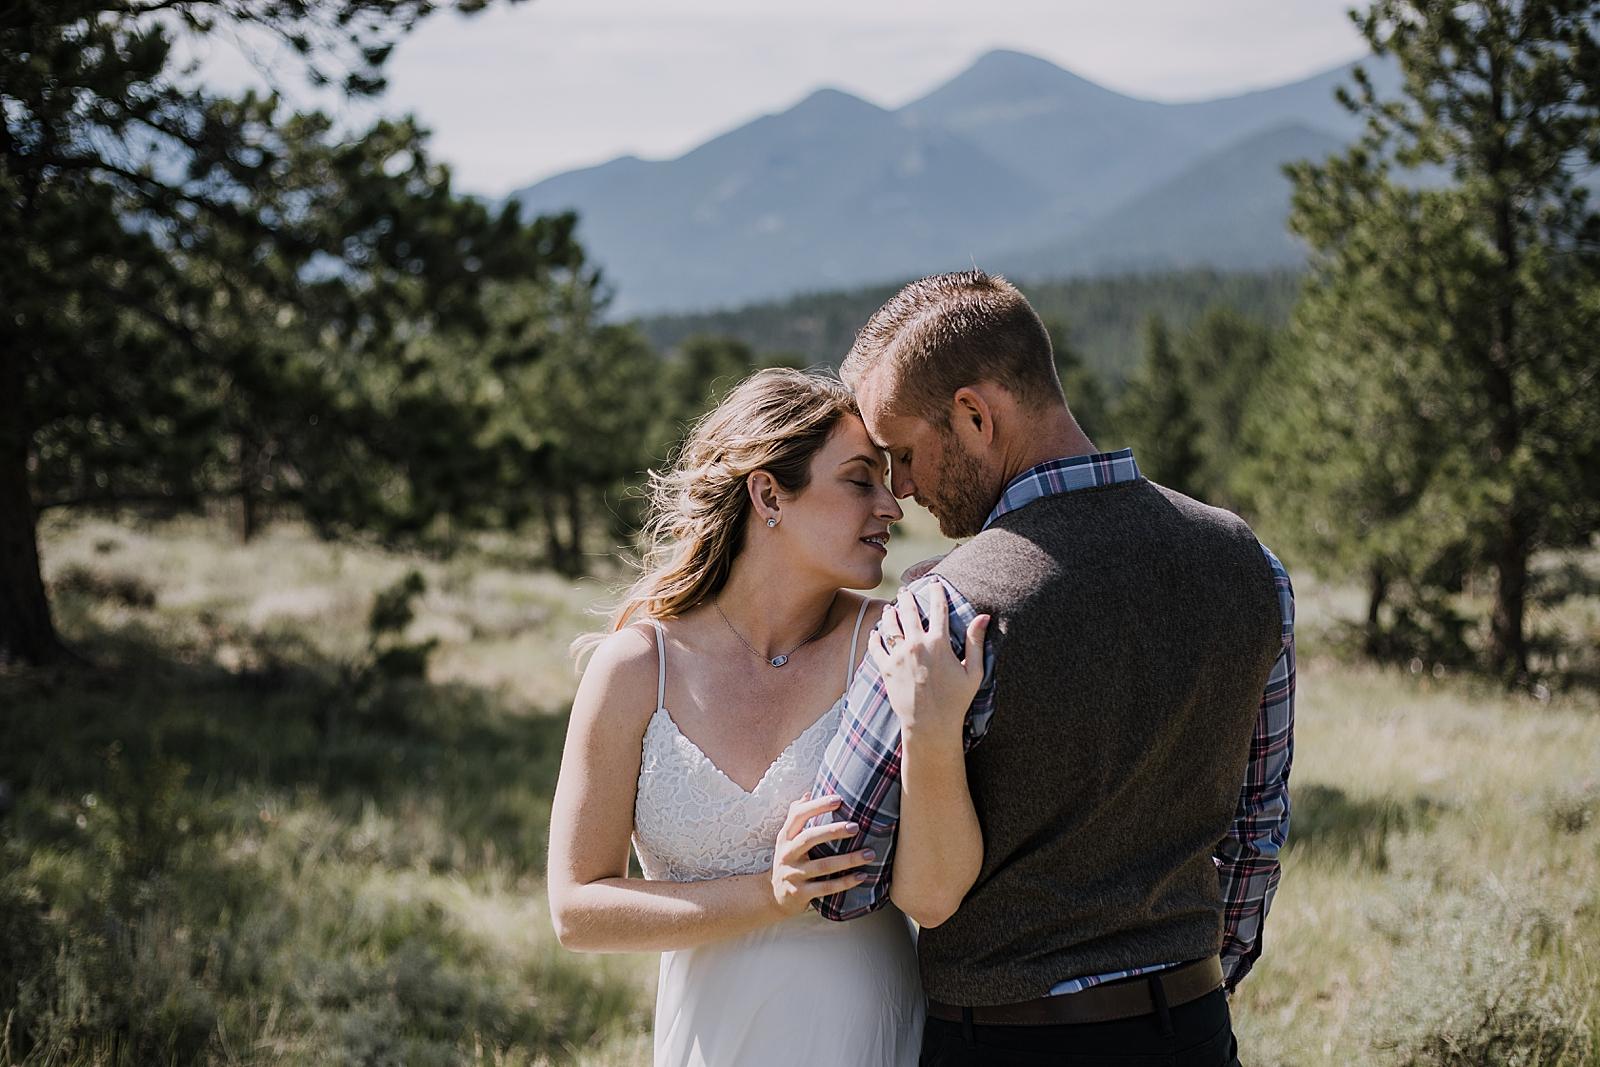 couple eloping, RMNP elopement ceremony, rocky mountain national park elopement, 3M curves elopement, self solemnizing, self solemnization, long's peak, summer elopement, estes park elopement